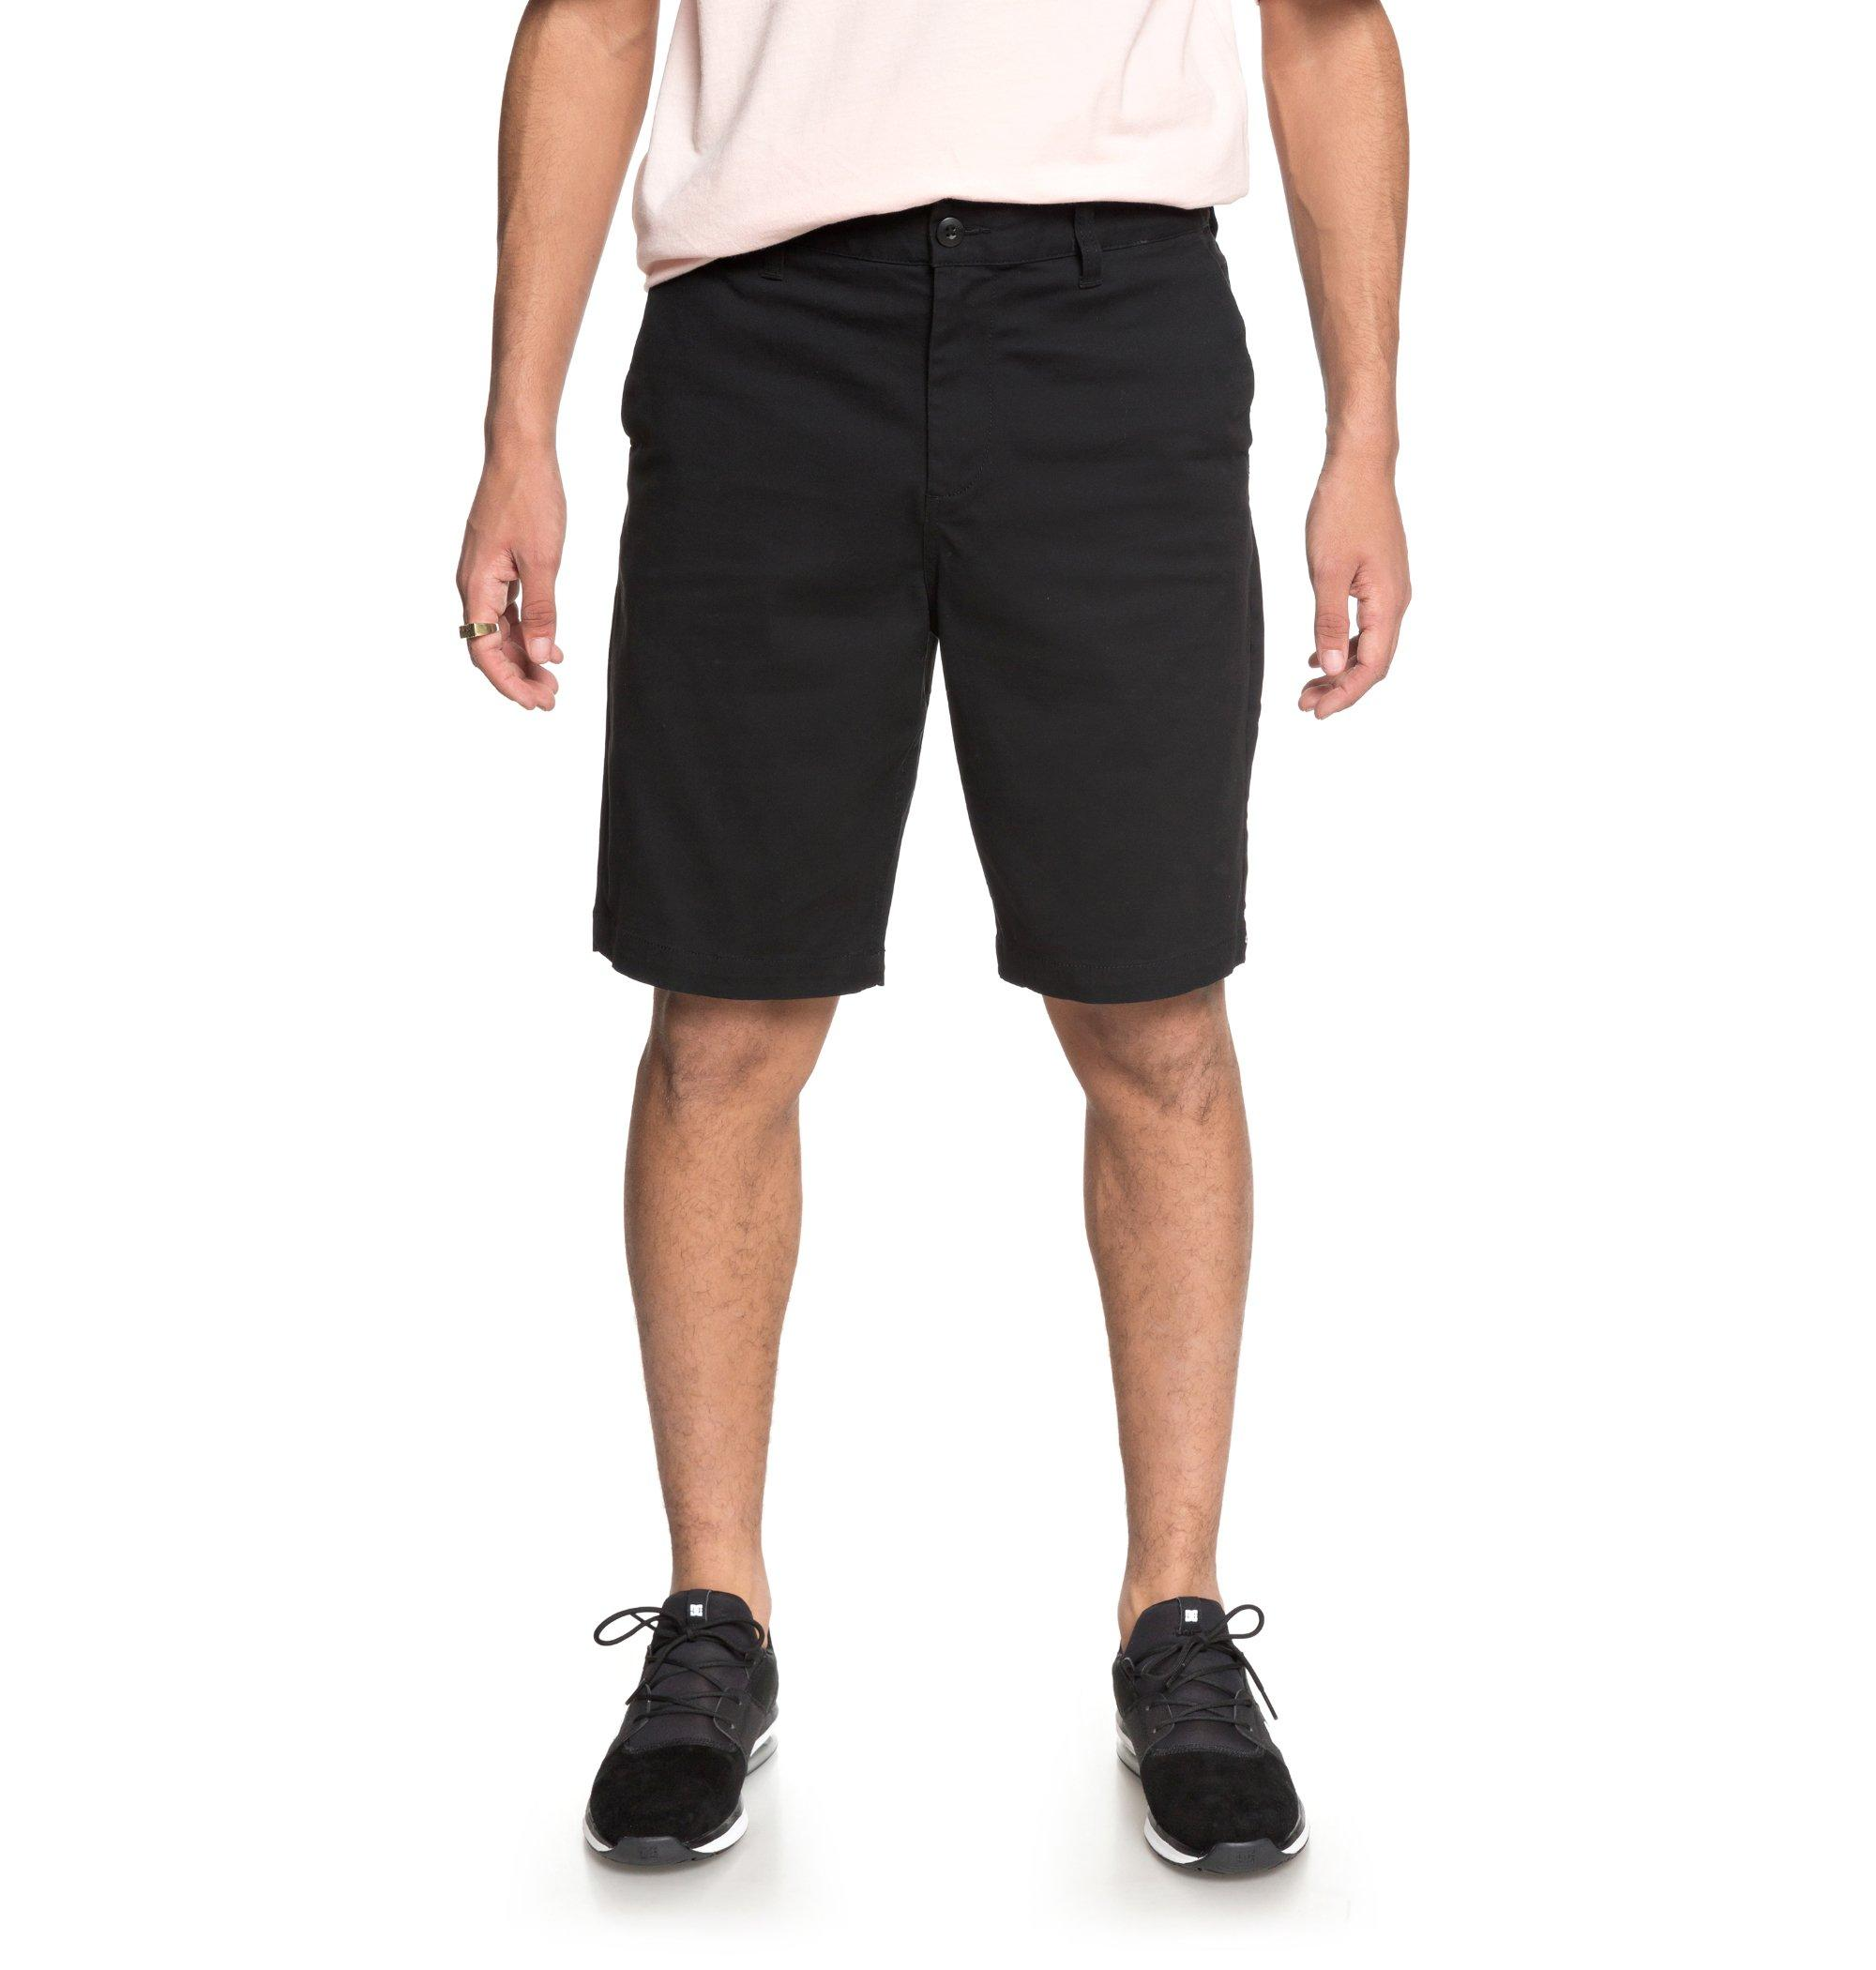 Szorty Dc Worker Straight 20,5 (Black) Ss18